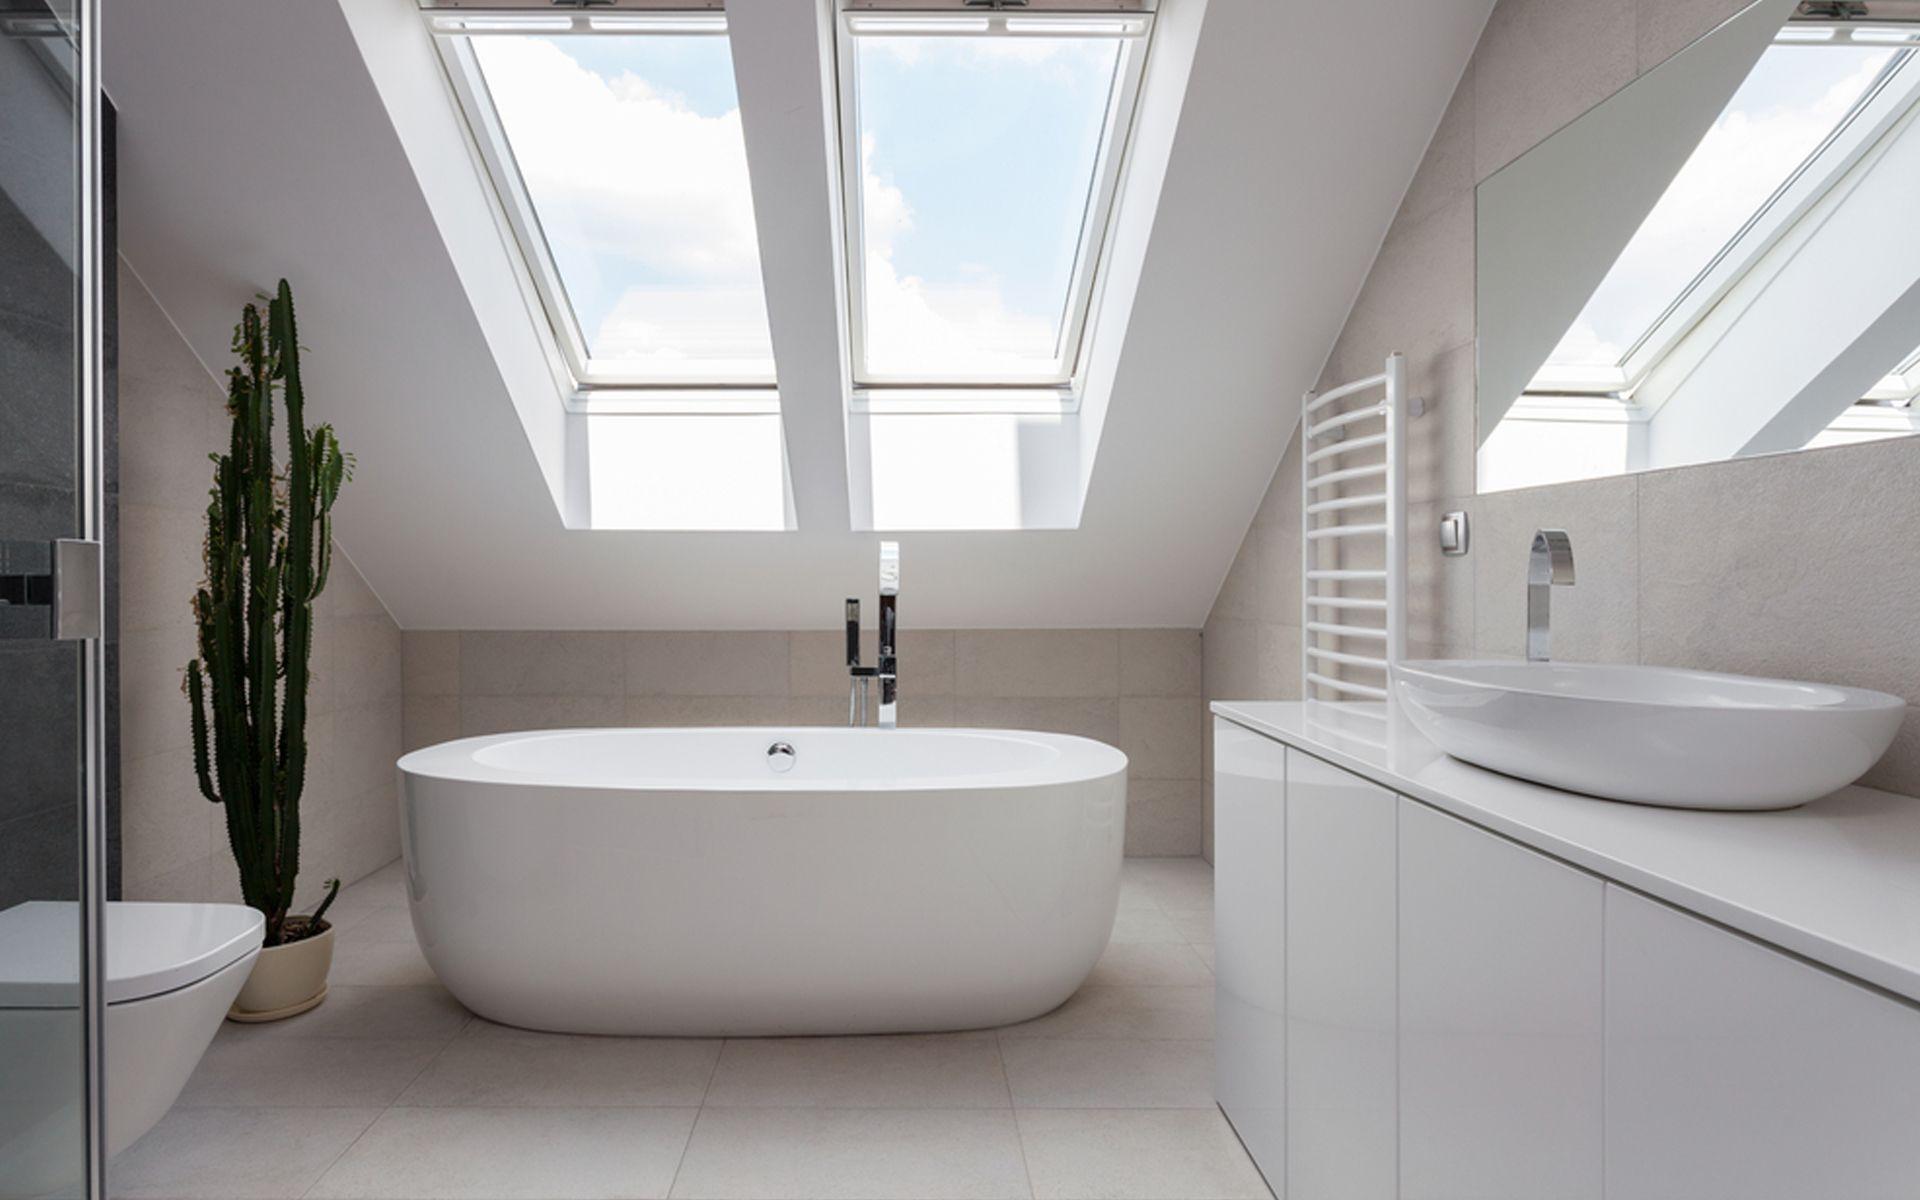 Stijlvol wit dakramen selectie badkamer pinterest bathroom